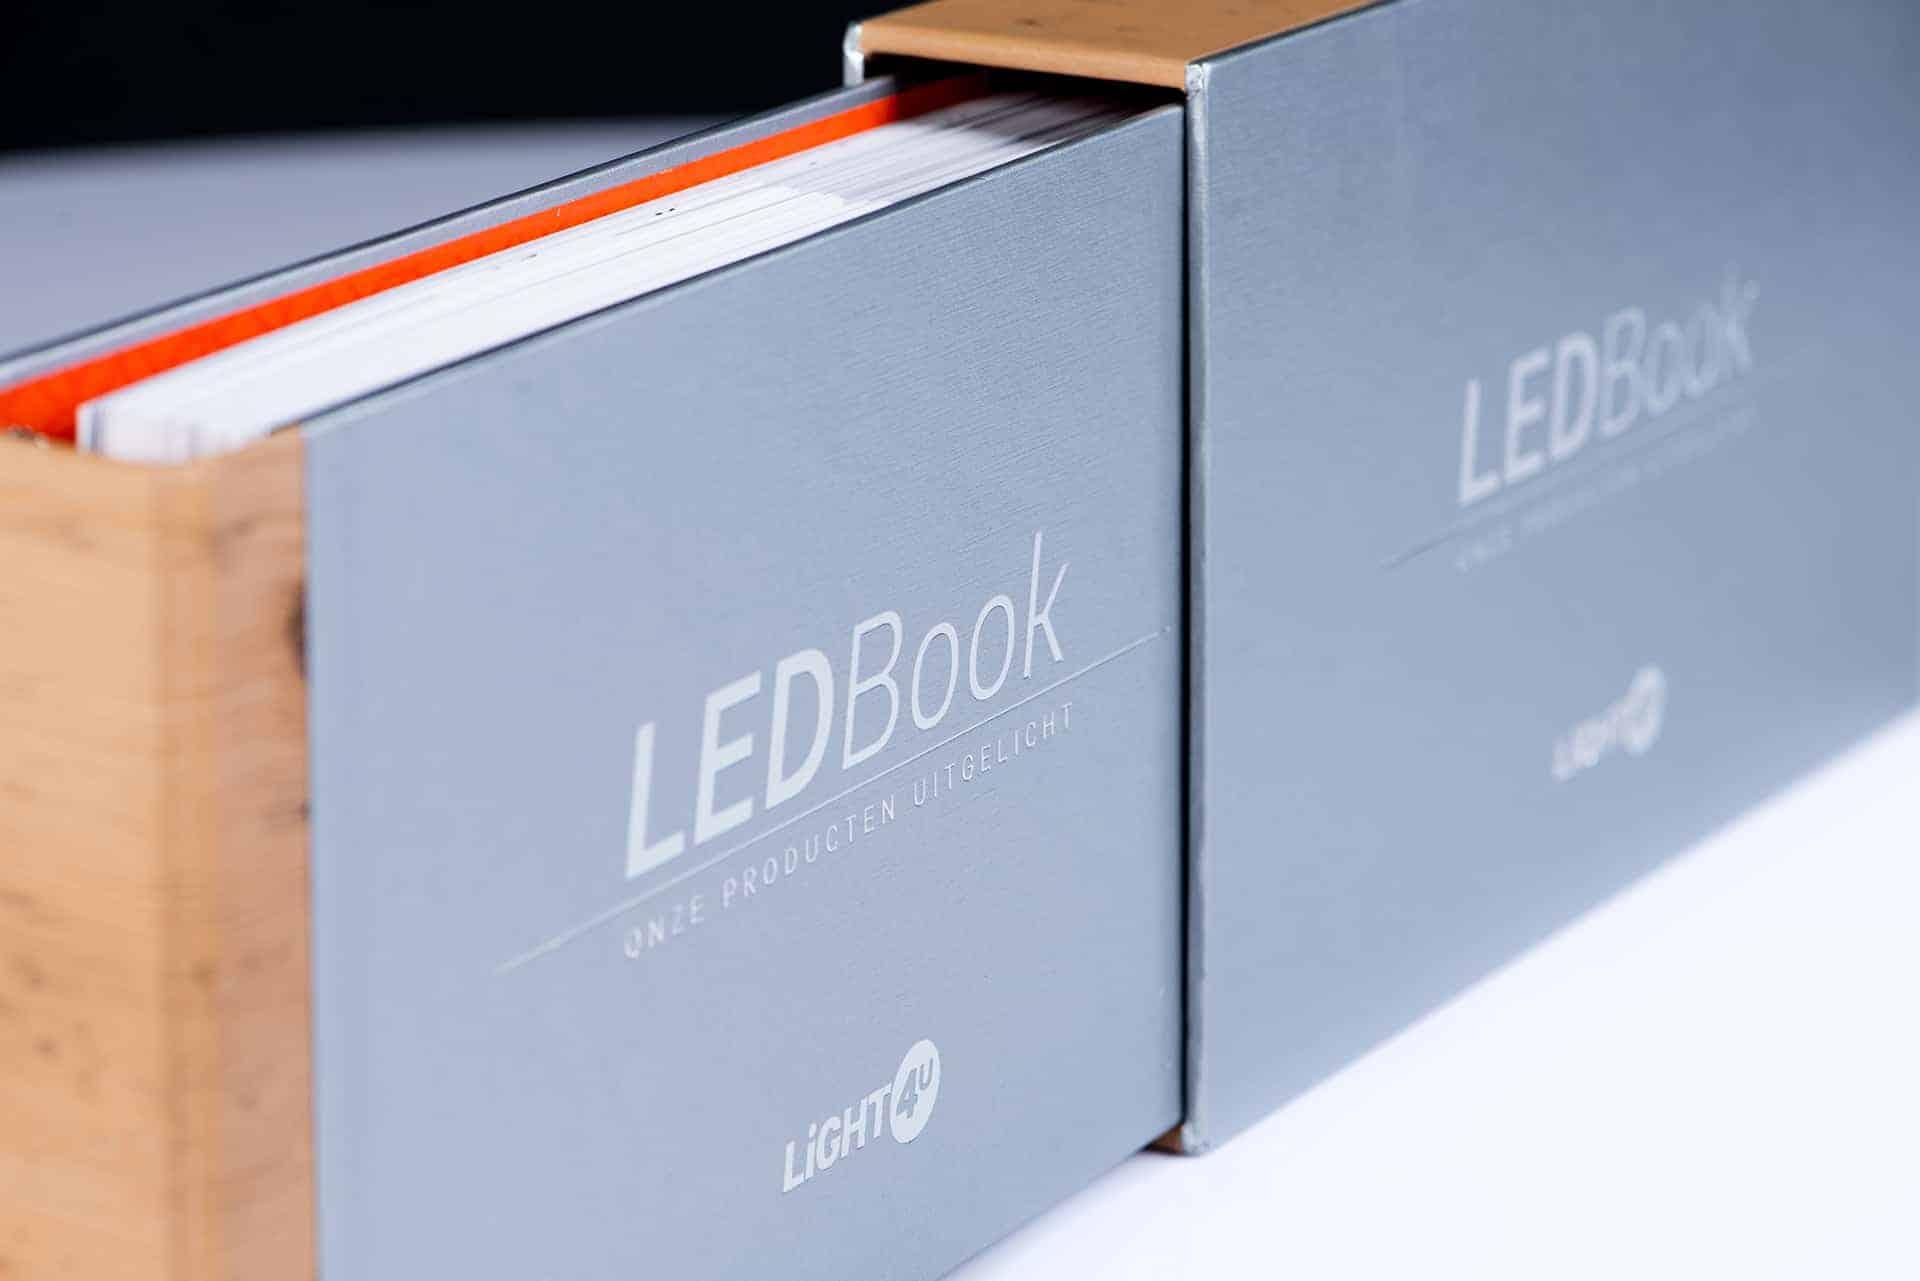 LEDBook